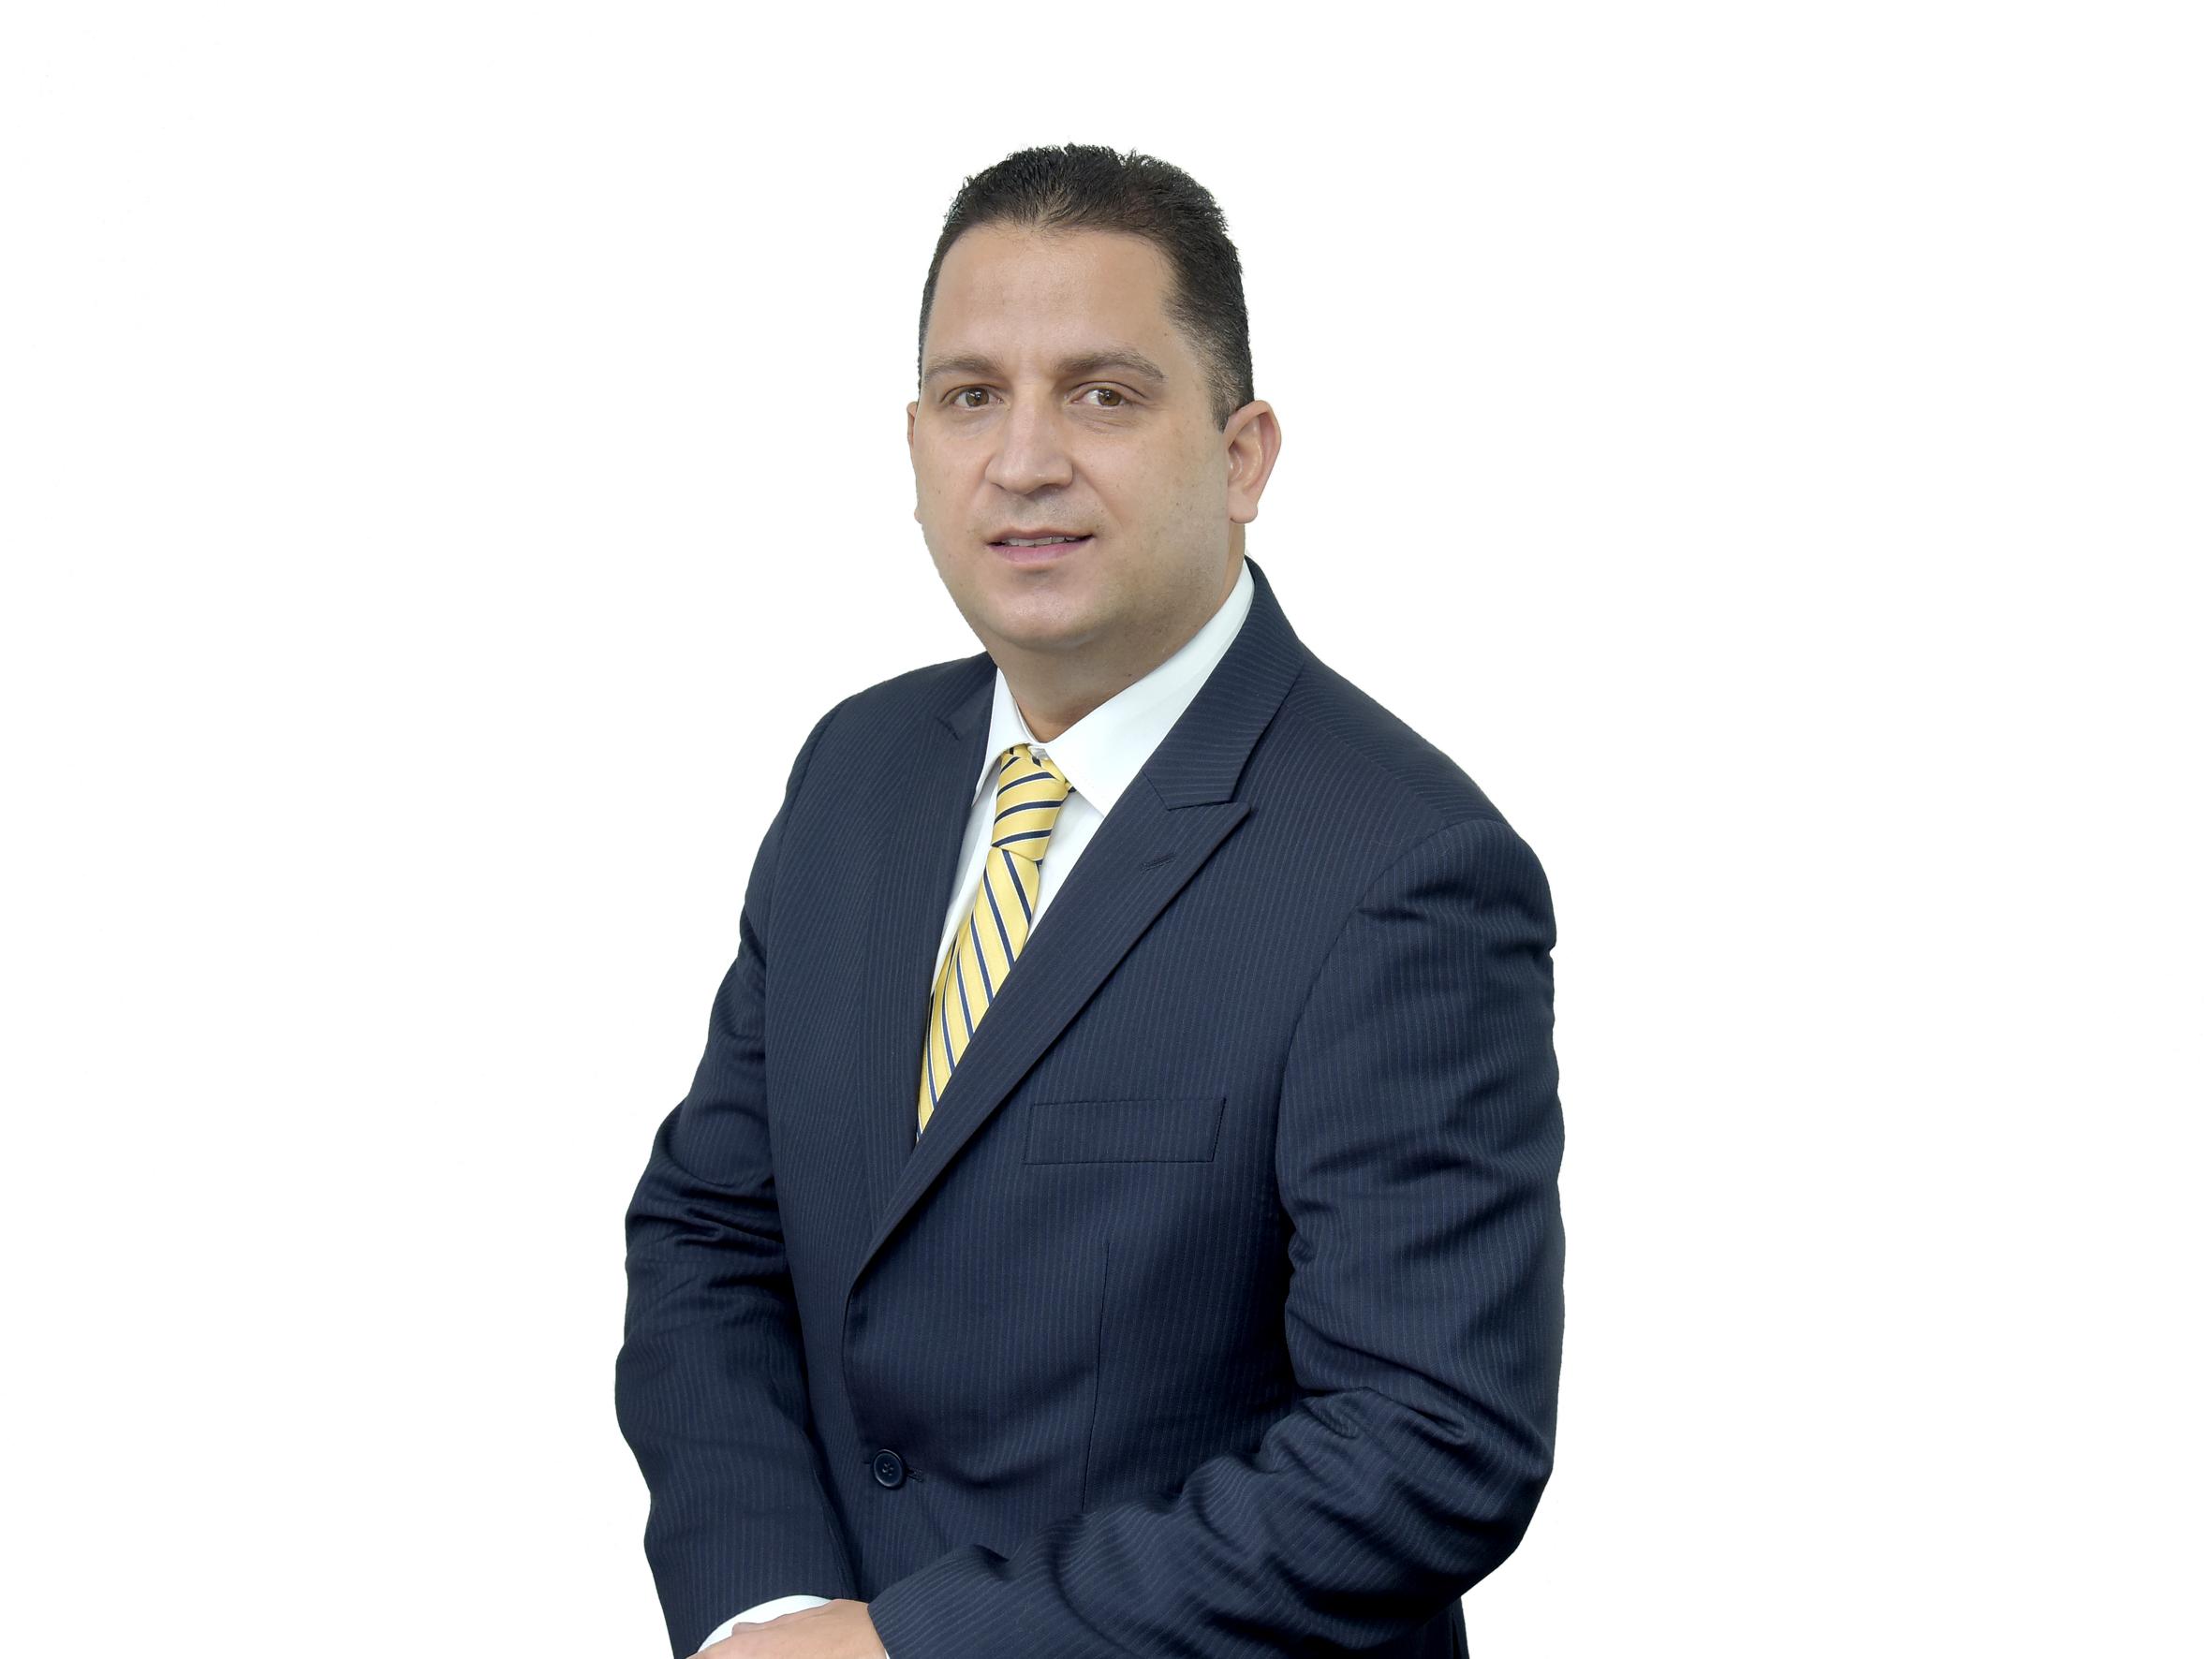 Rodrigo Elías Daza Vega